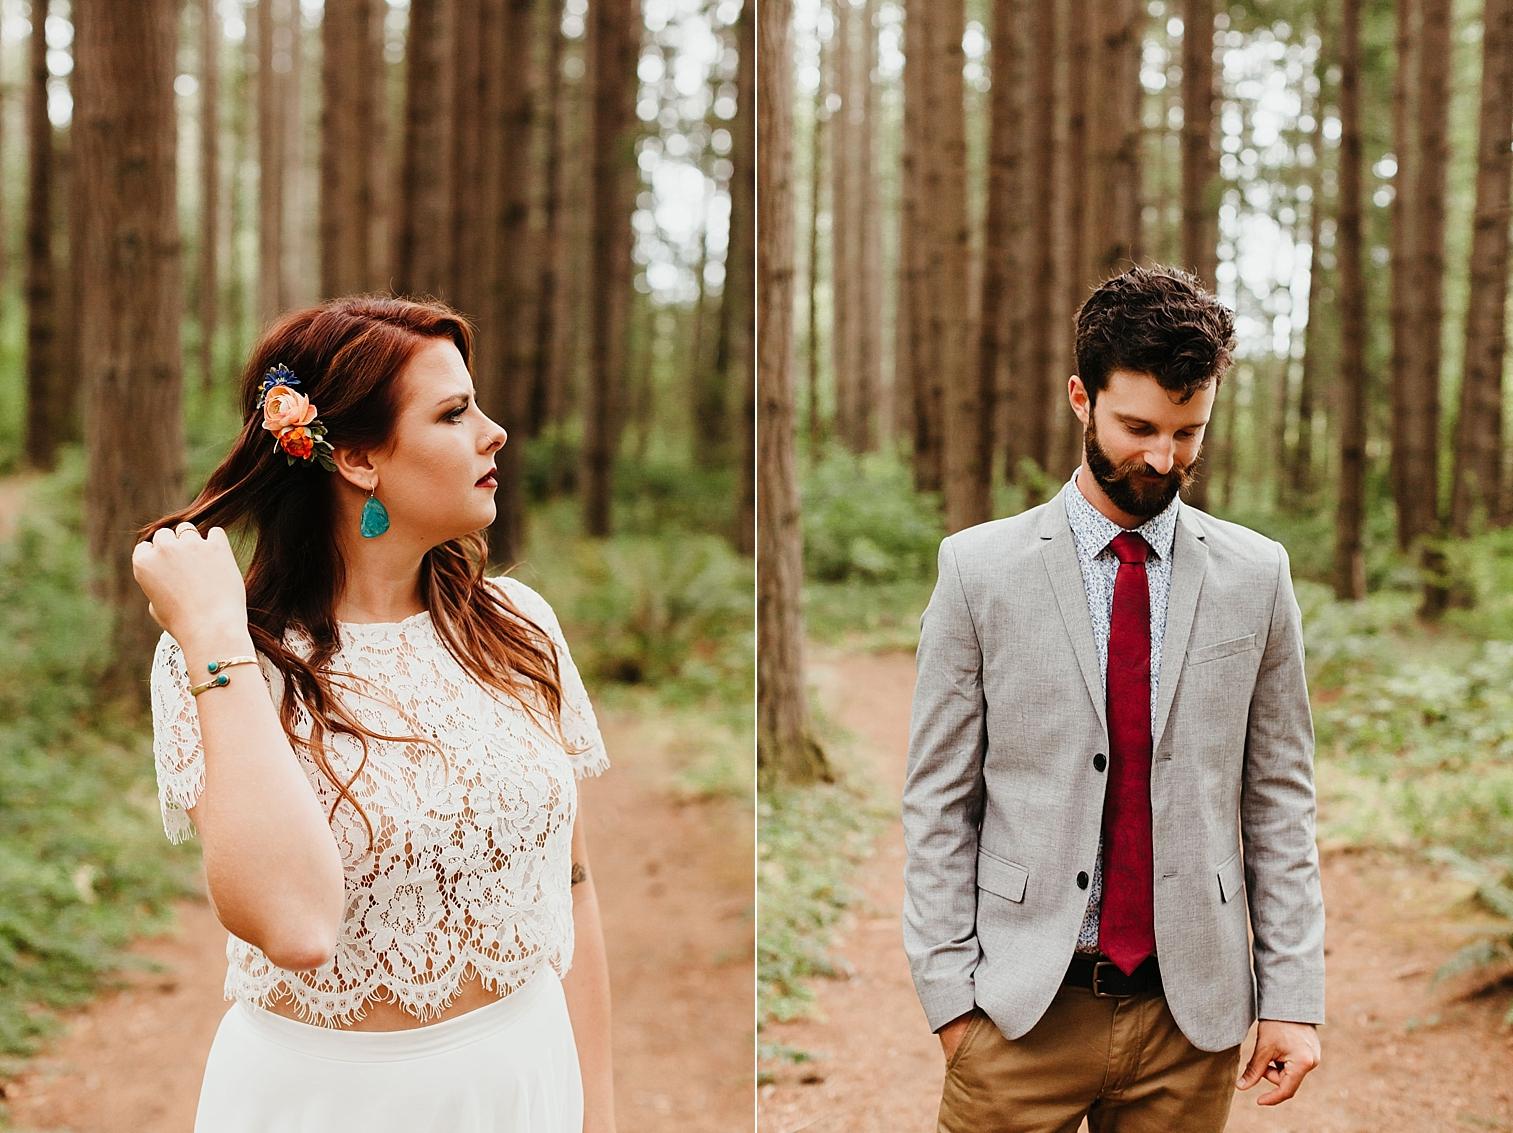 Summer-Camp-Themed-Wedding-27.jpg